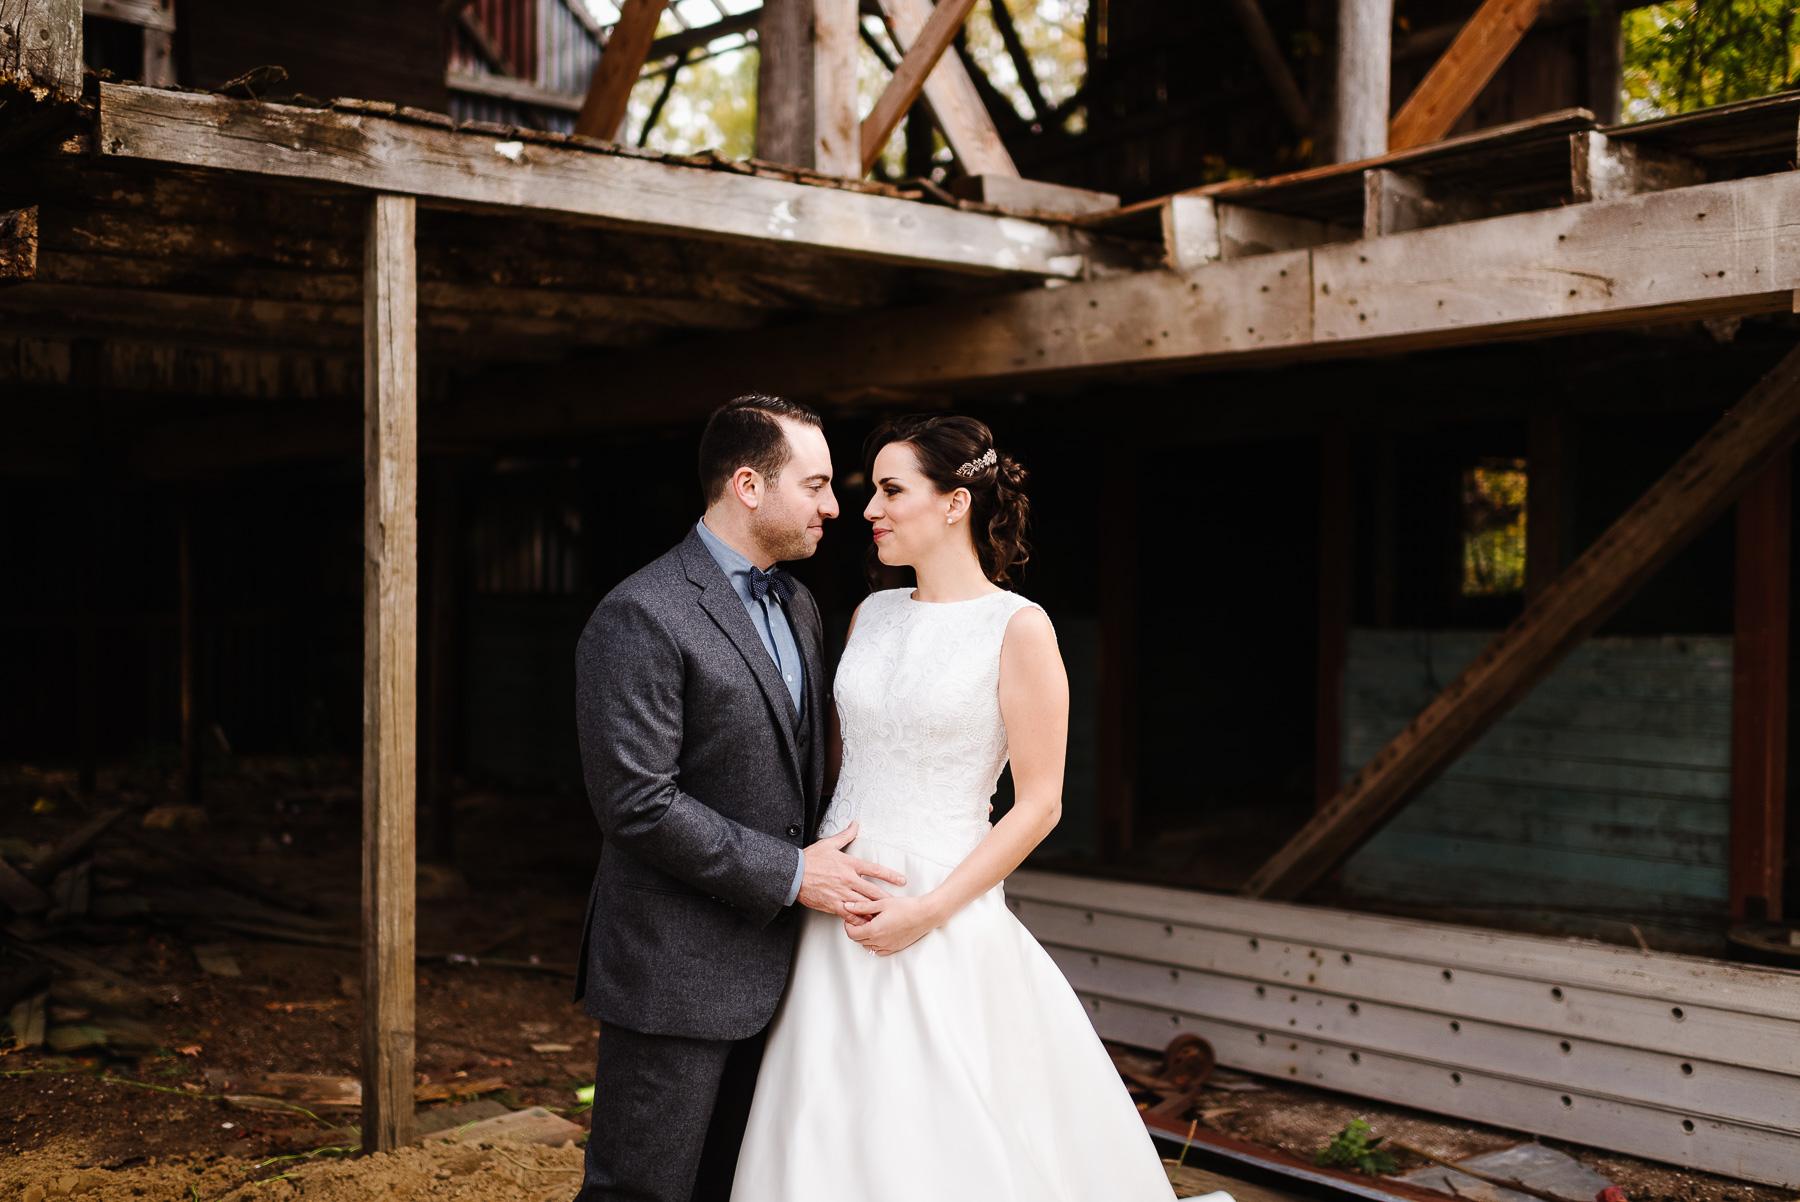 30-Laurita Winery Wedding New Jersey Wedding Photographer Laurita Winery Weddings Longbrook Photography.jpg